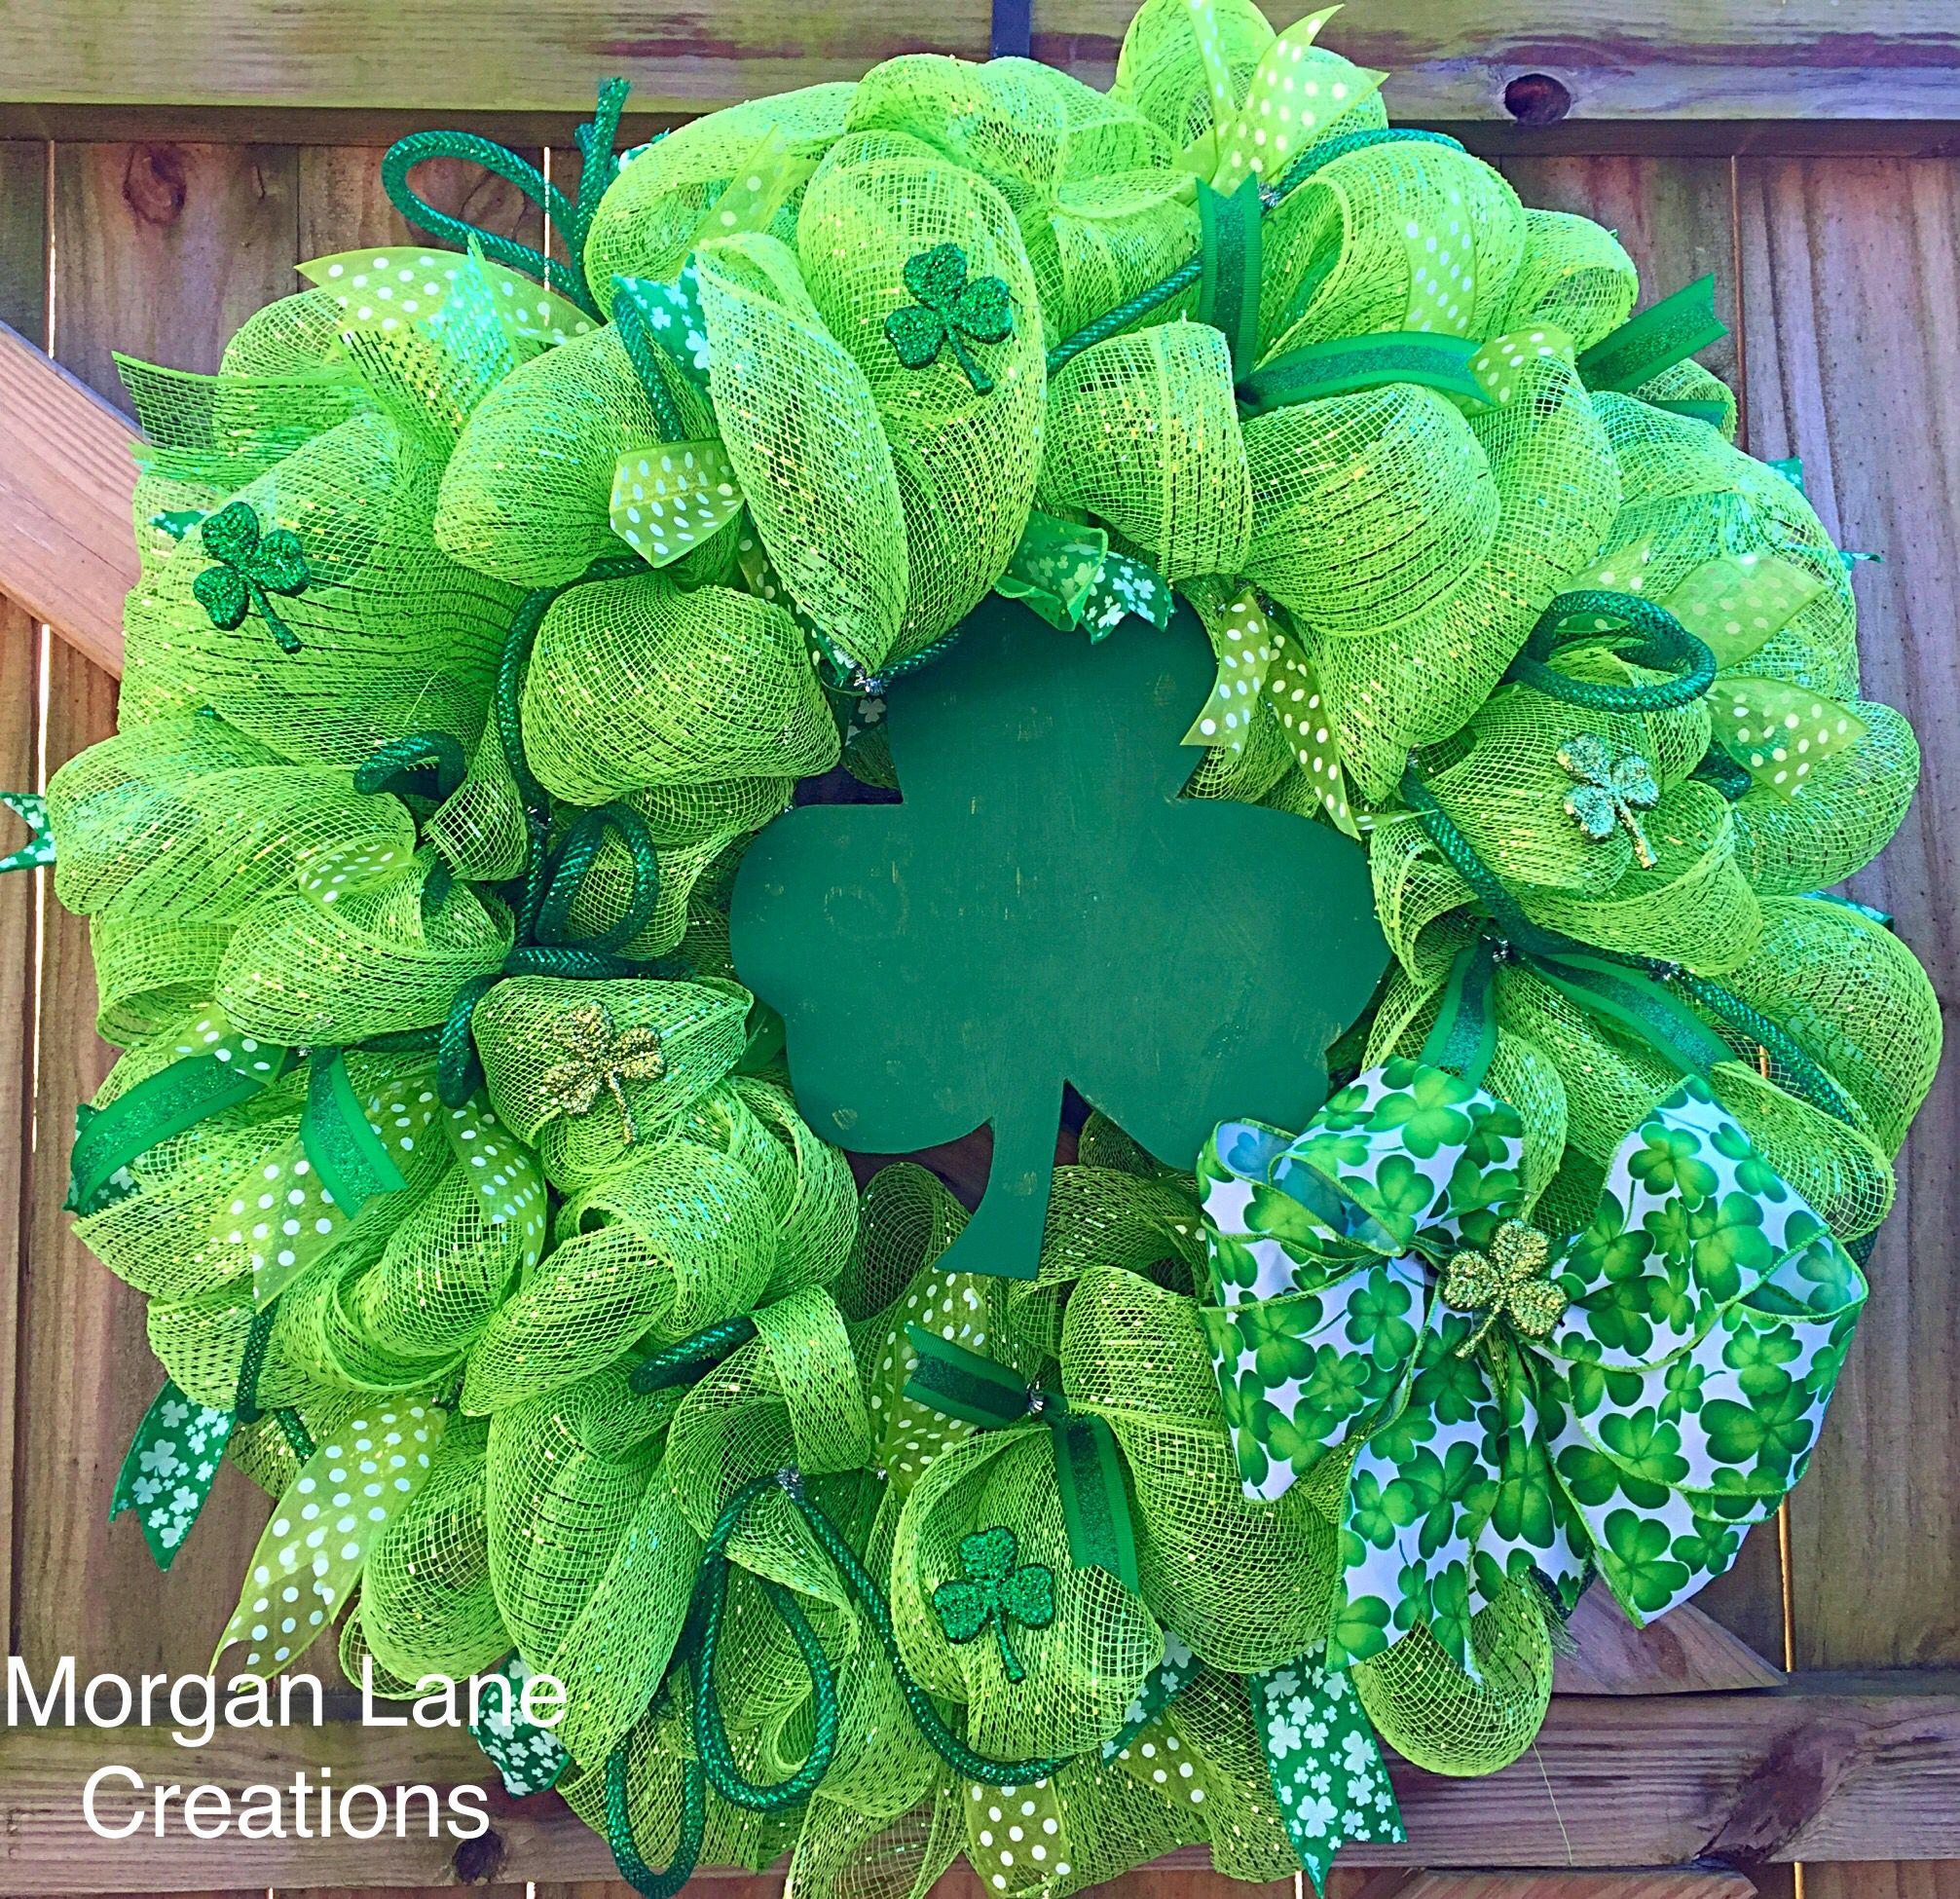 St.patricks day wreath $40 Morgan Lane creations! Find us on facebook!!